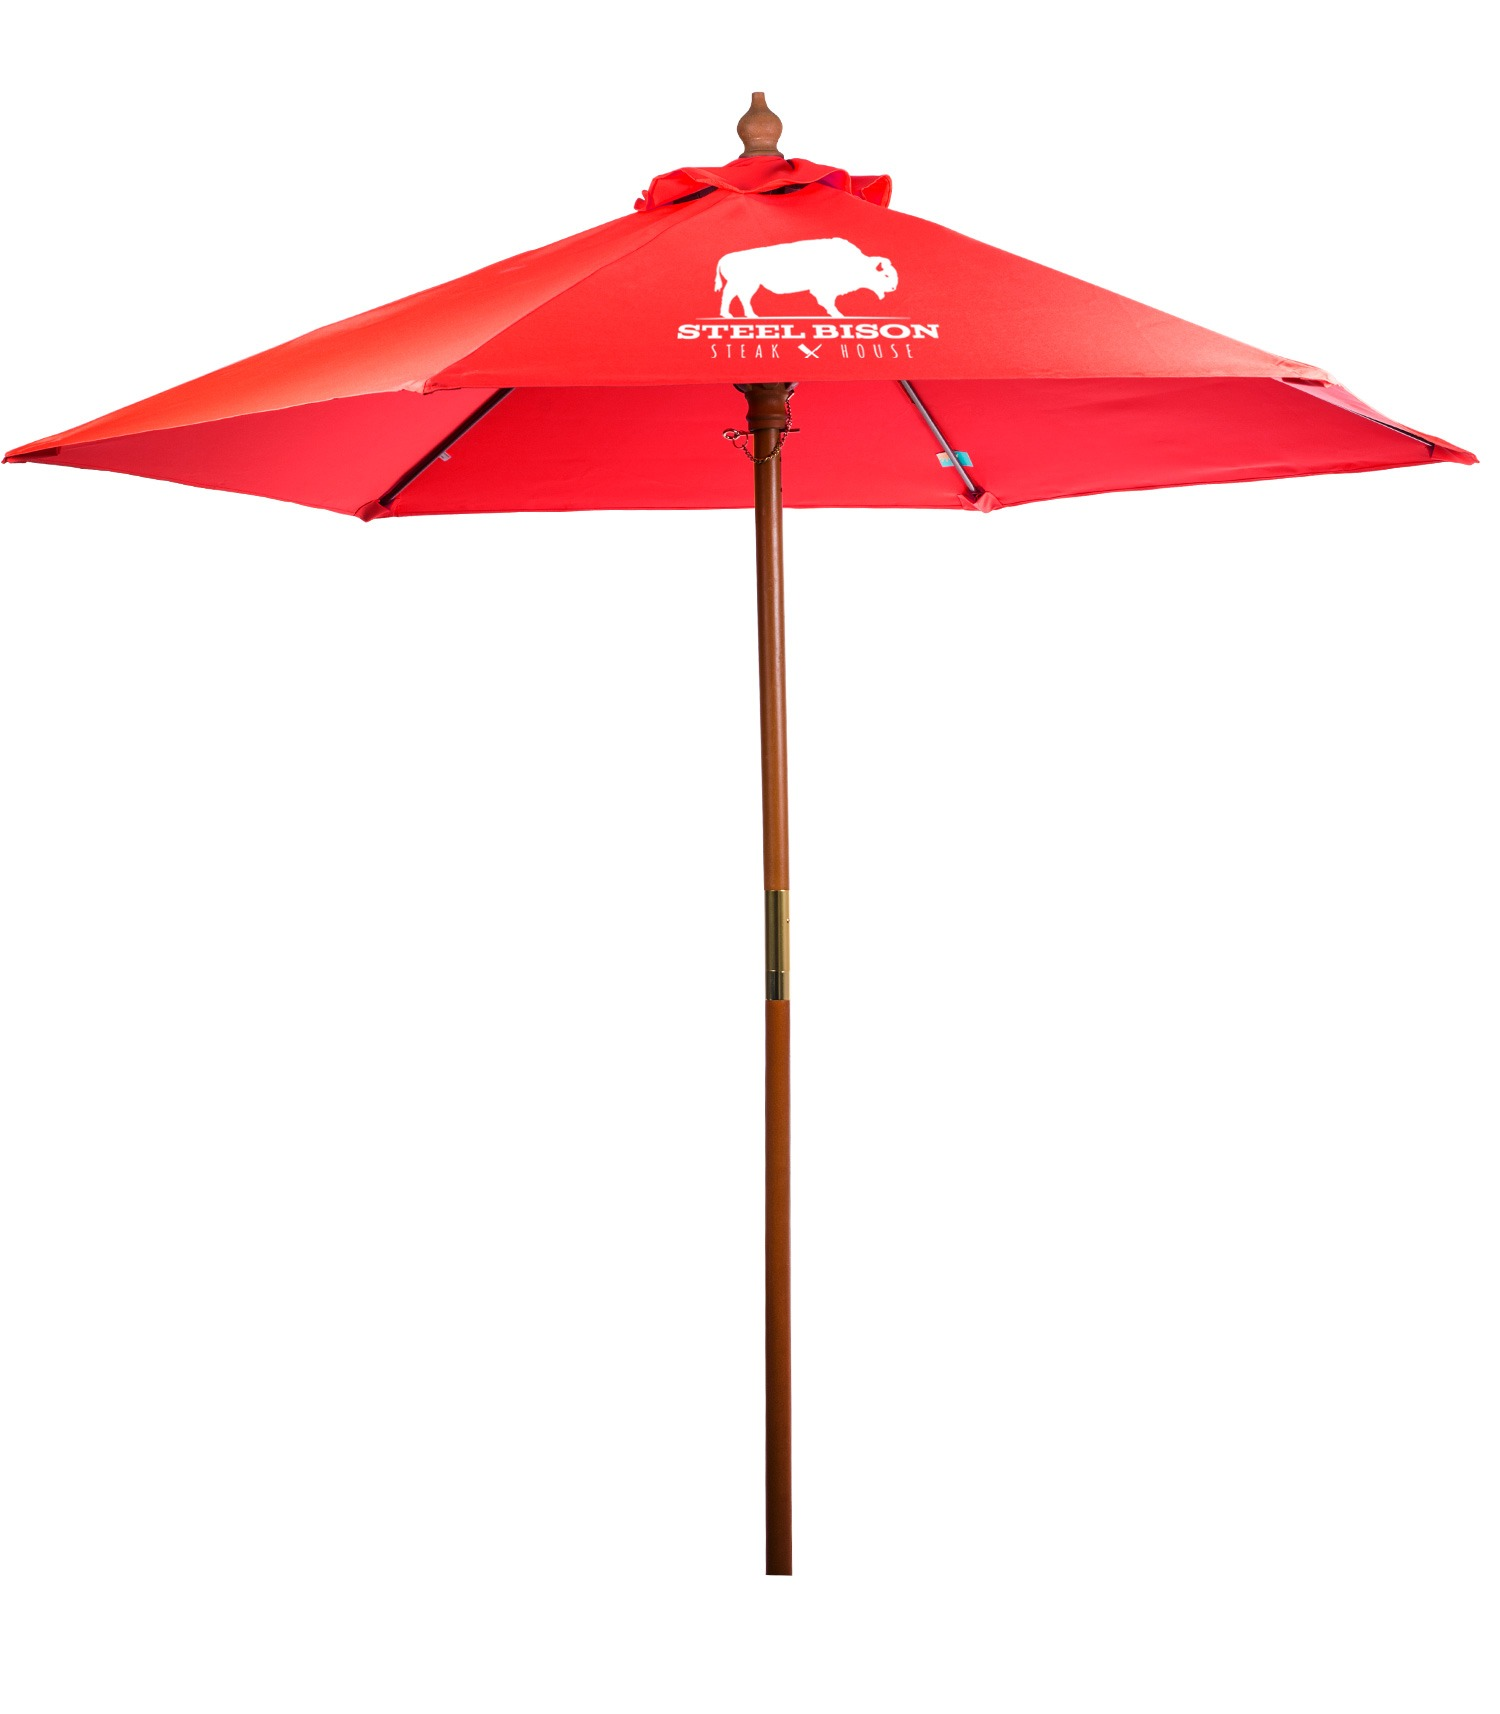 546443837-154 - 7' Bamboo Recycled Market Umbrella - thumbnail